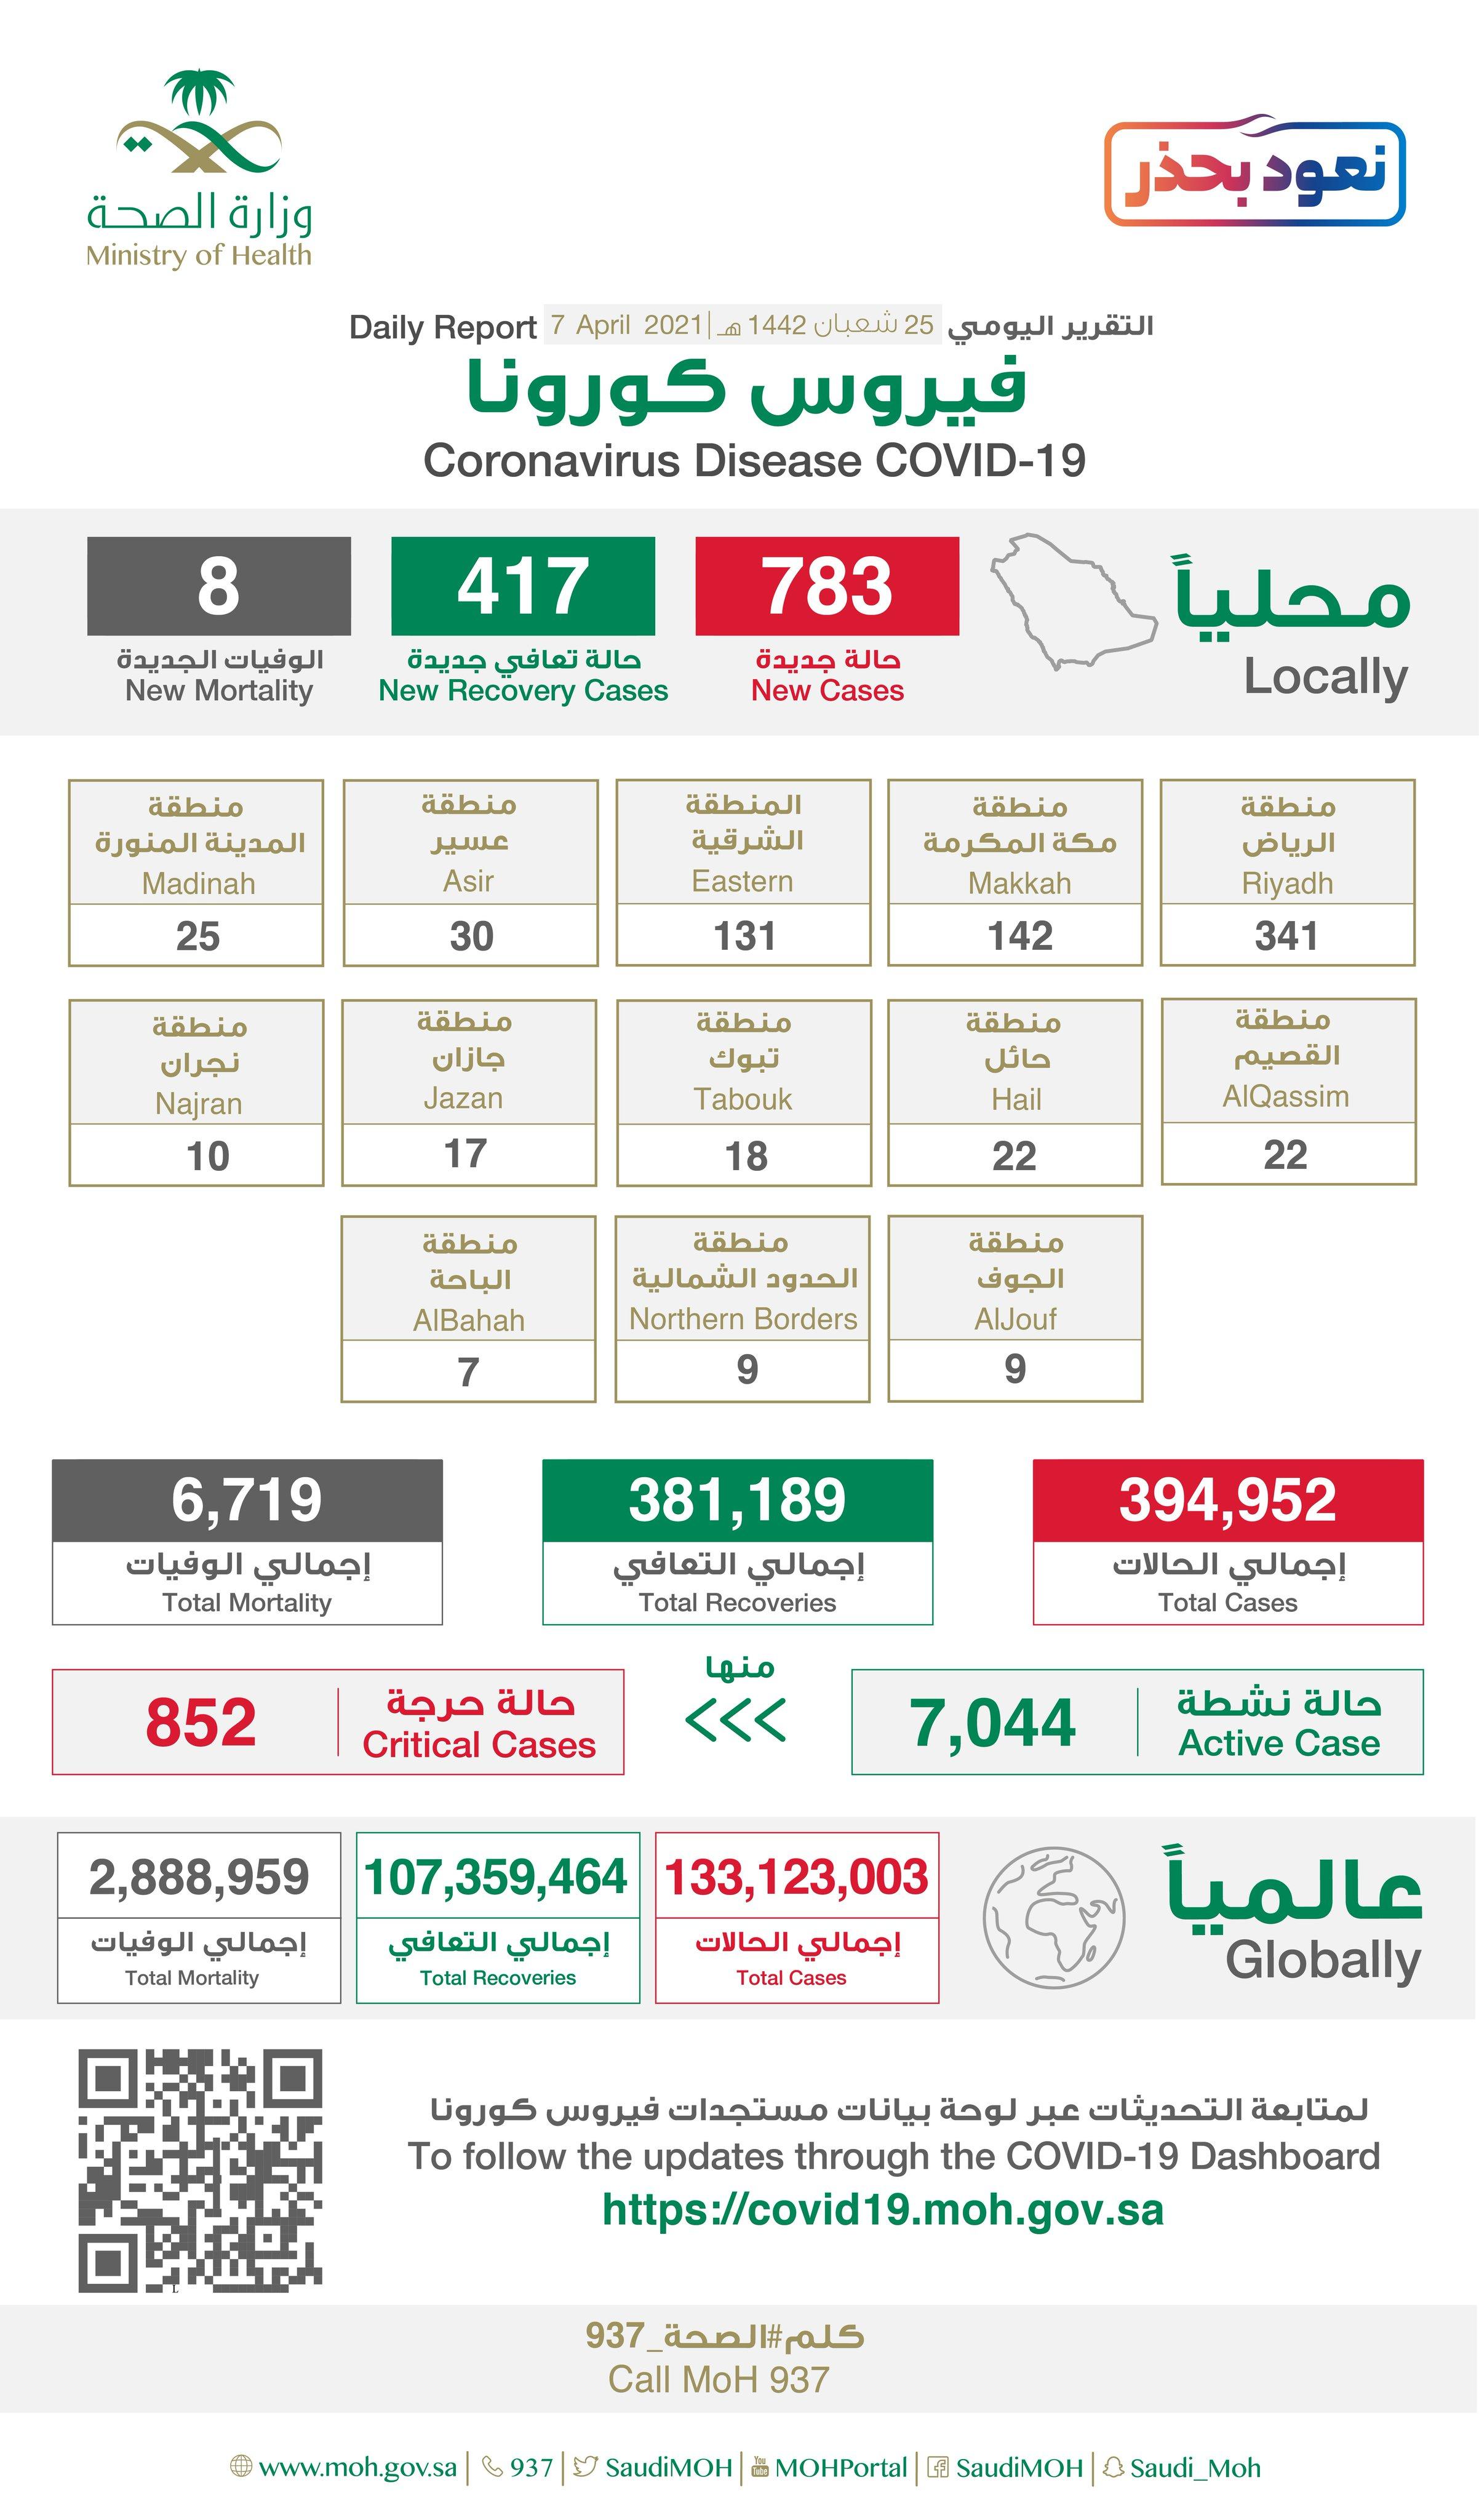 Saudi Arabia Coronavirus : Total Cases :394,952, New Cases : 783, Cured : 381,189, Deaths: 6,719, Active Cases : 7,044